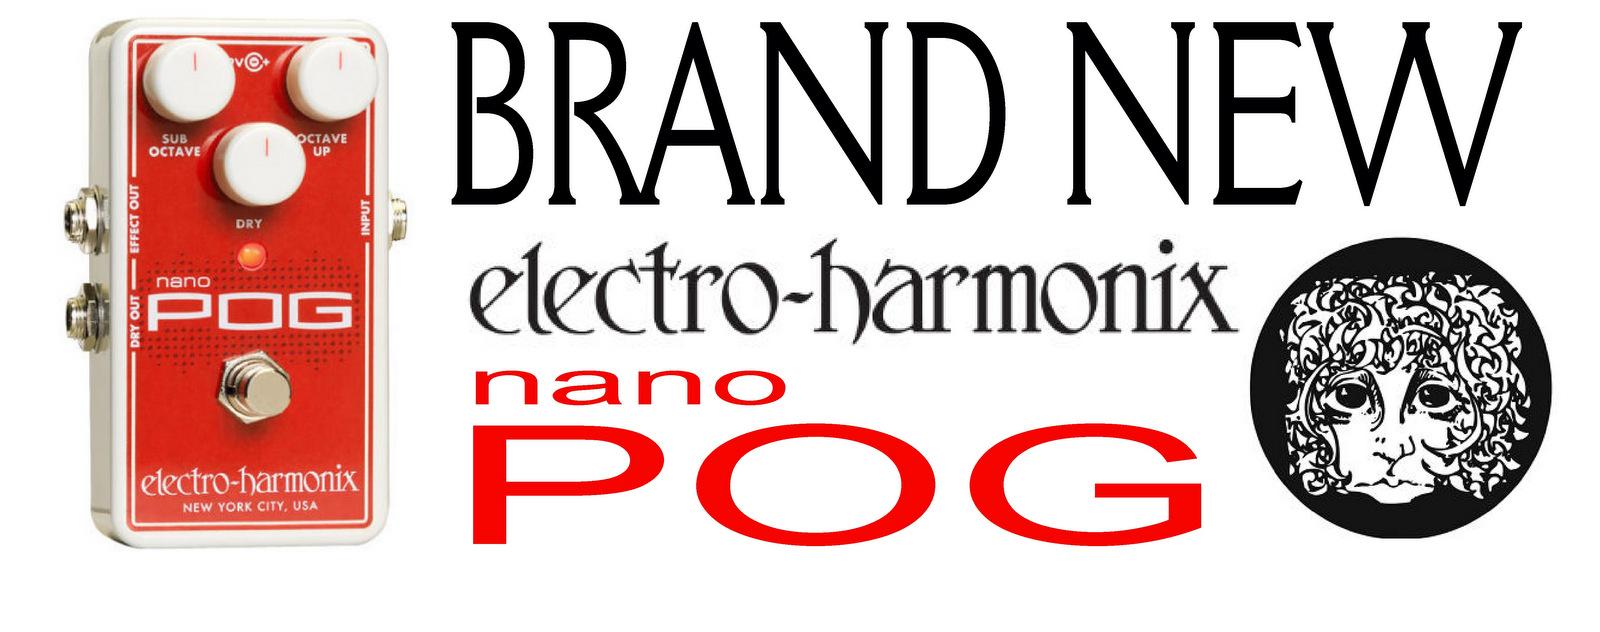 Brand NEW Electro-Harmonix Nano POG!